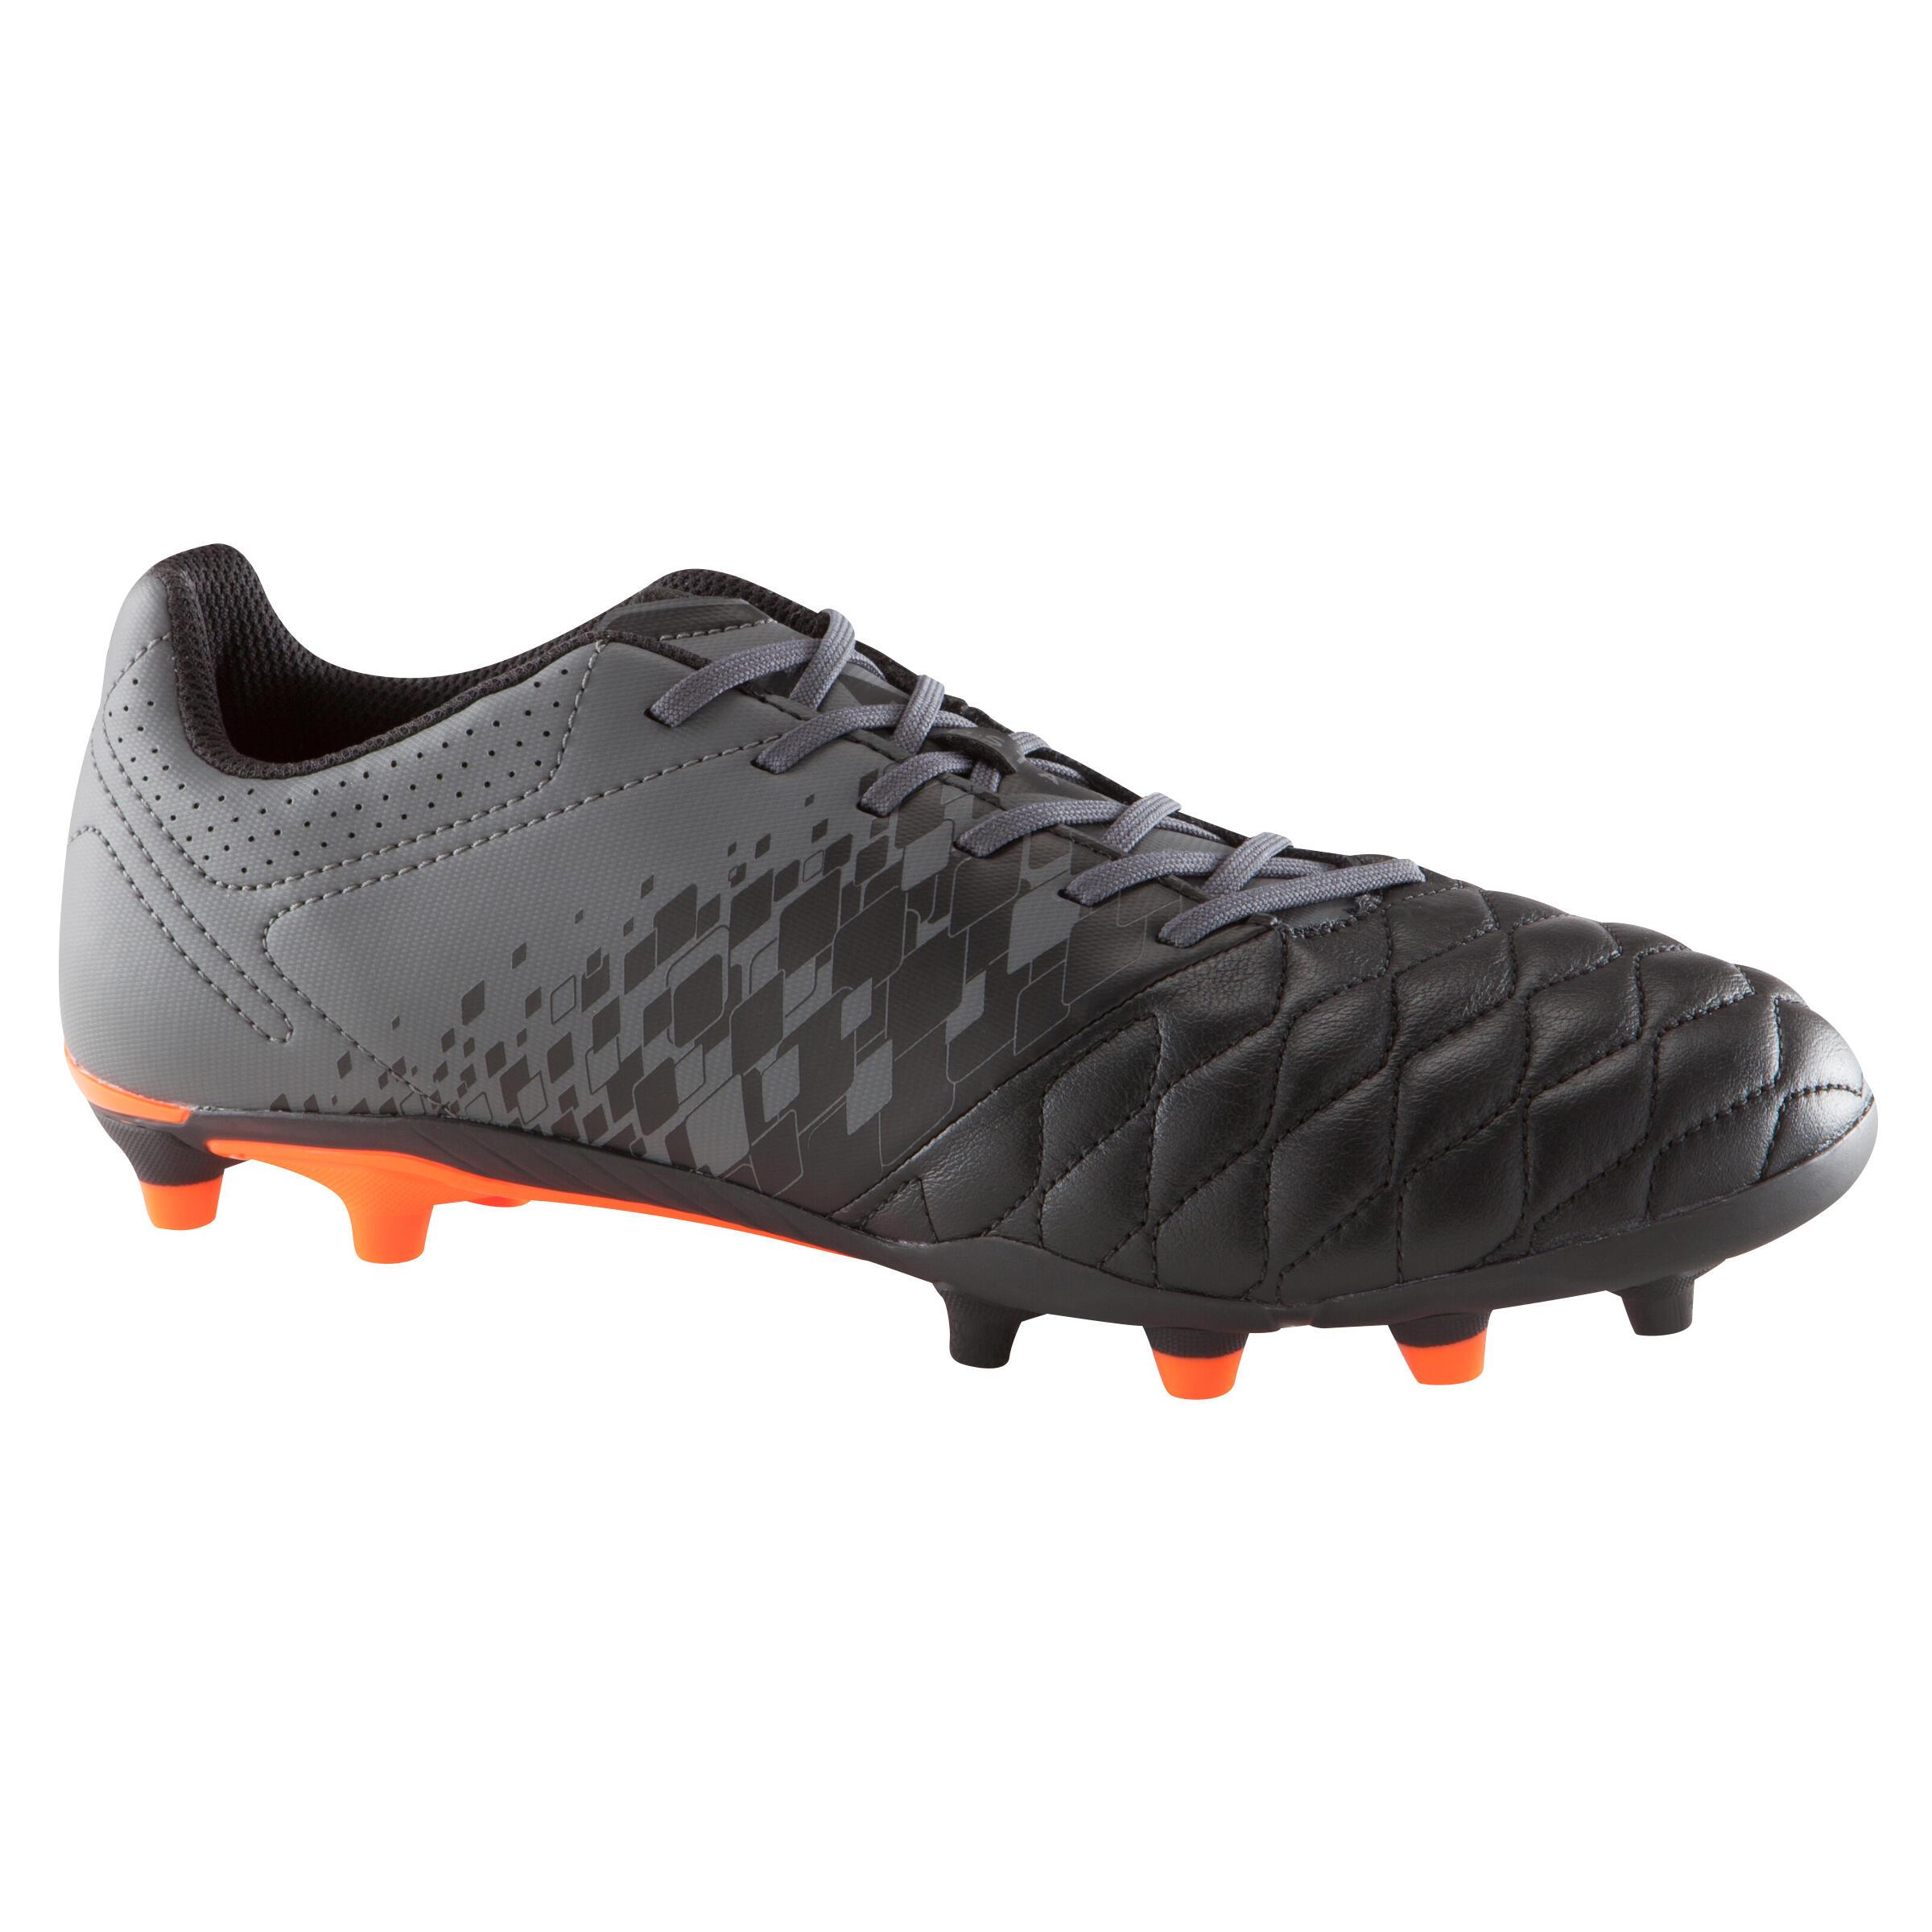 Tenis de fútbol para adulto terrenos secos Agility 900 FG negro gris